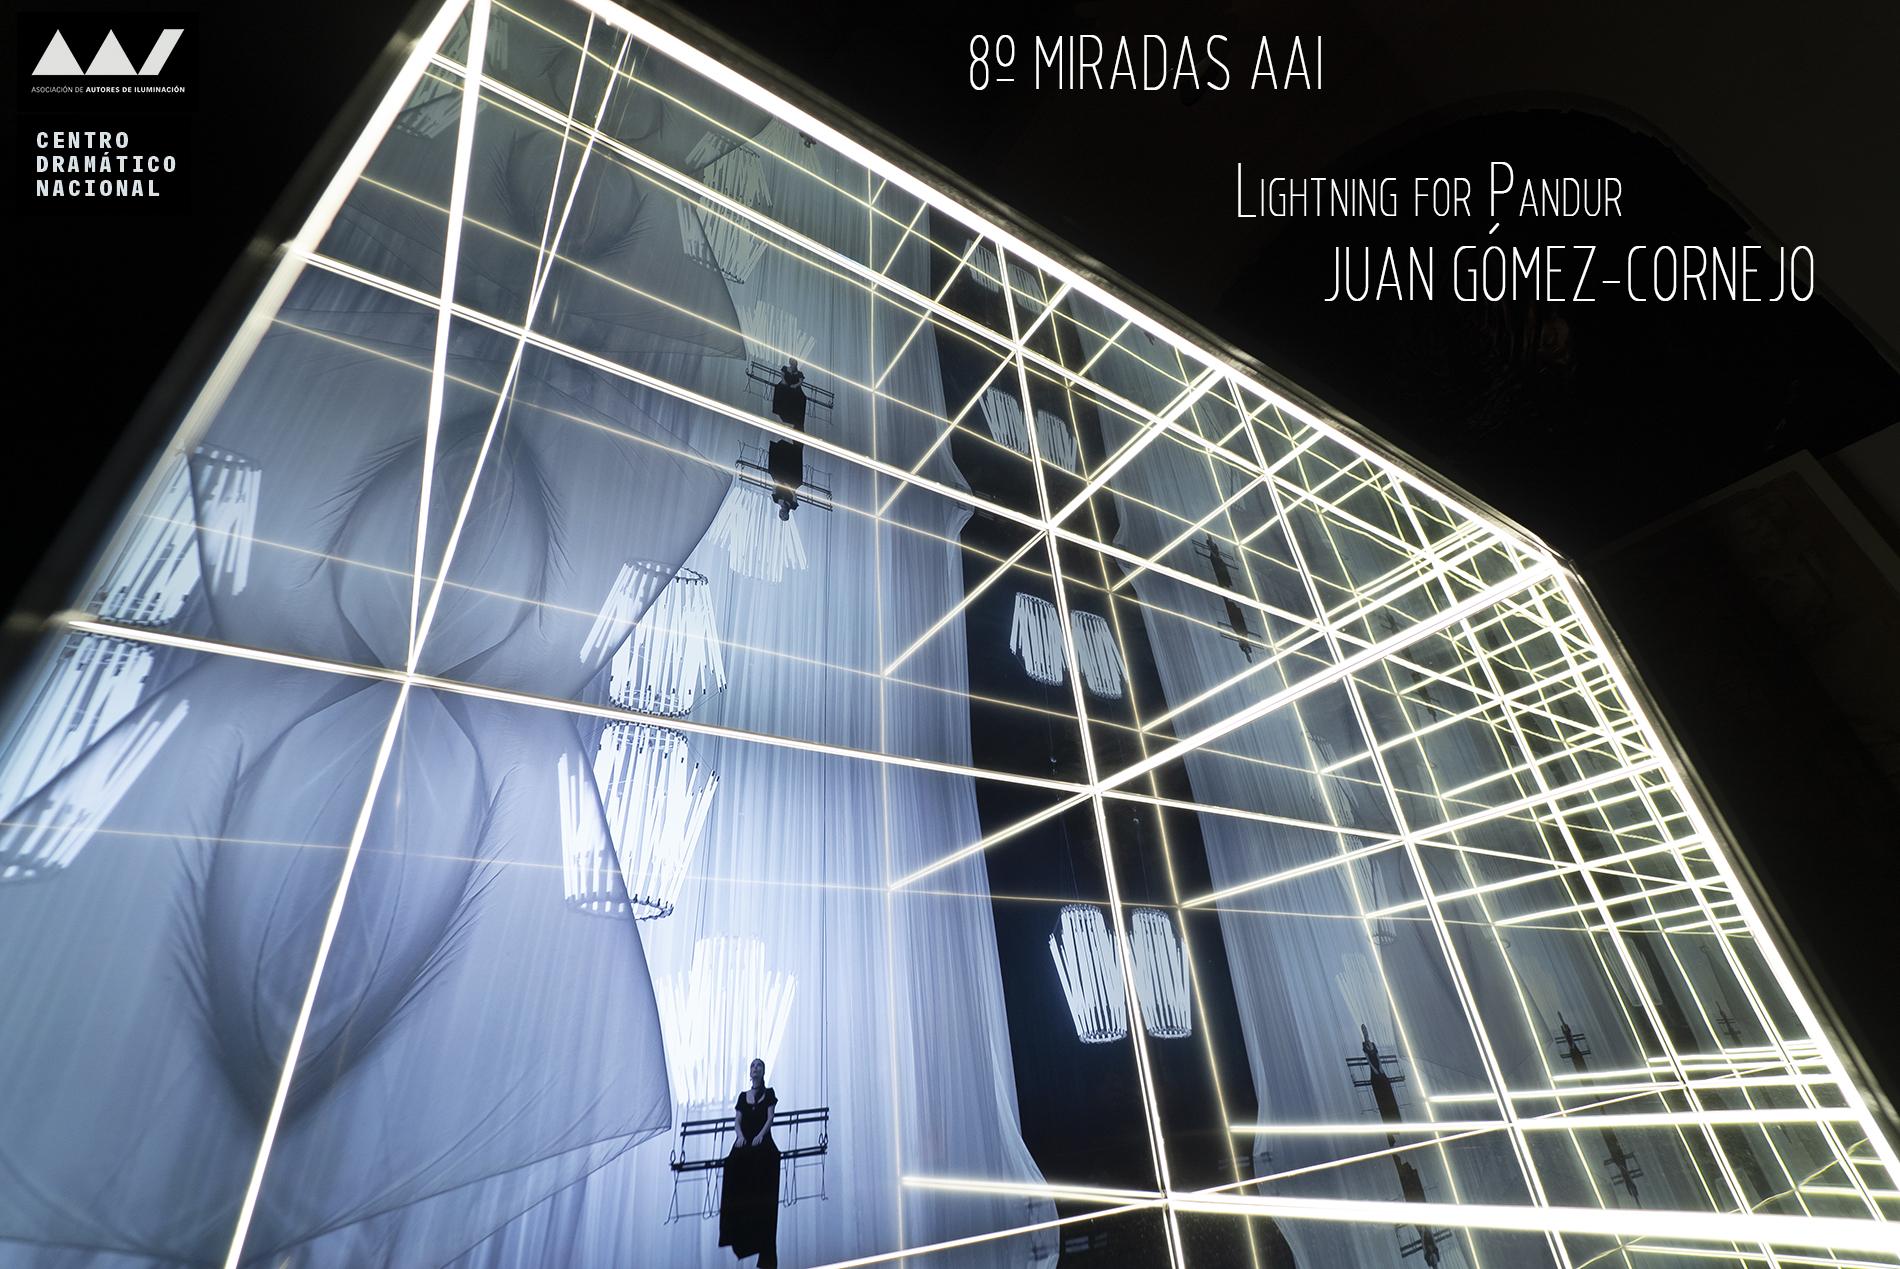 8ª MIRADAS AAI   LIGHTING FOR PANDUR   FRAGMENTOS DEL ALMA